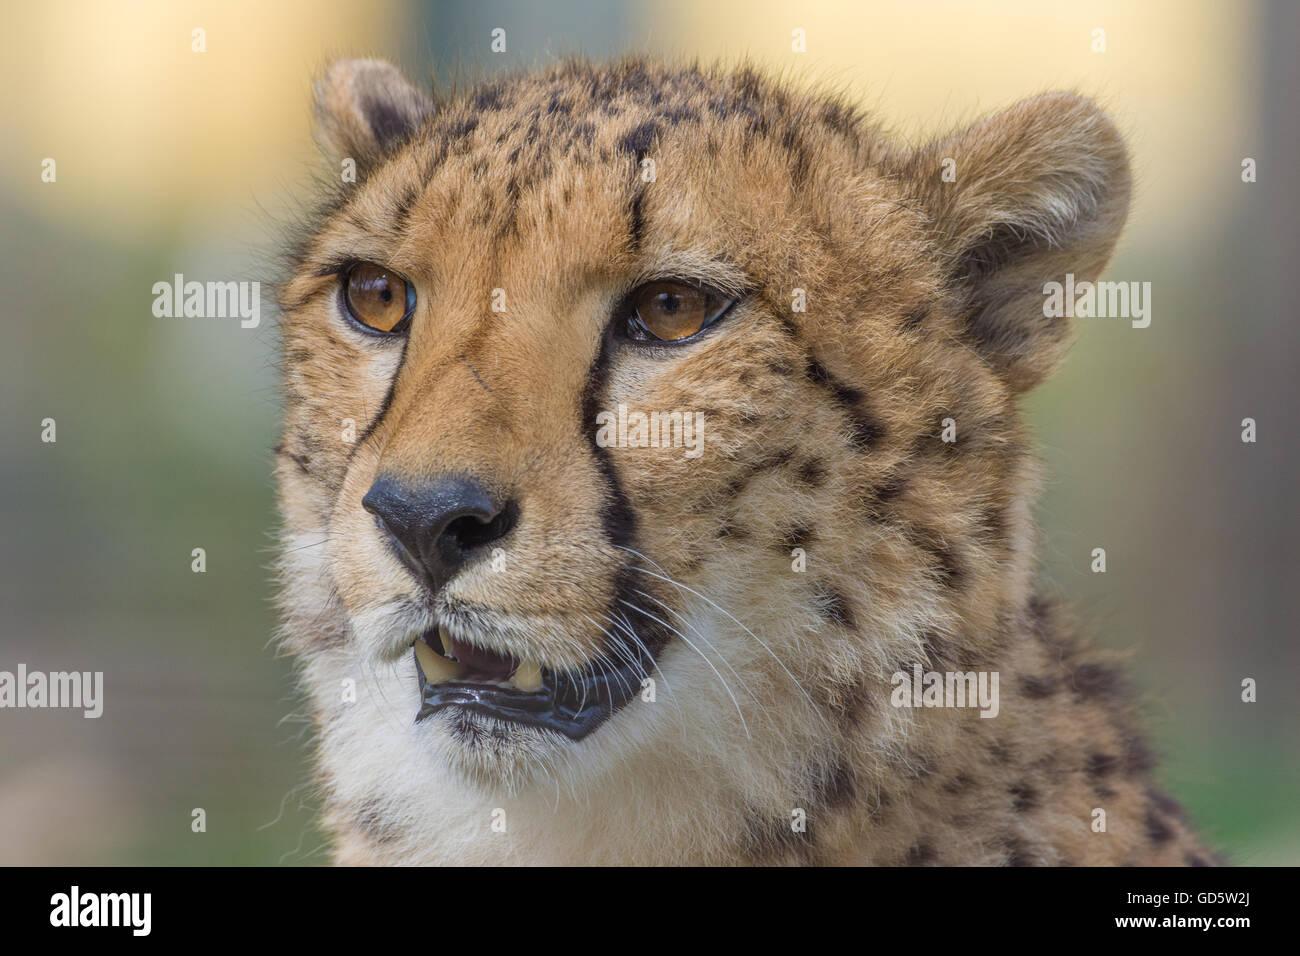 Cheetah closeup series - Stock Image